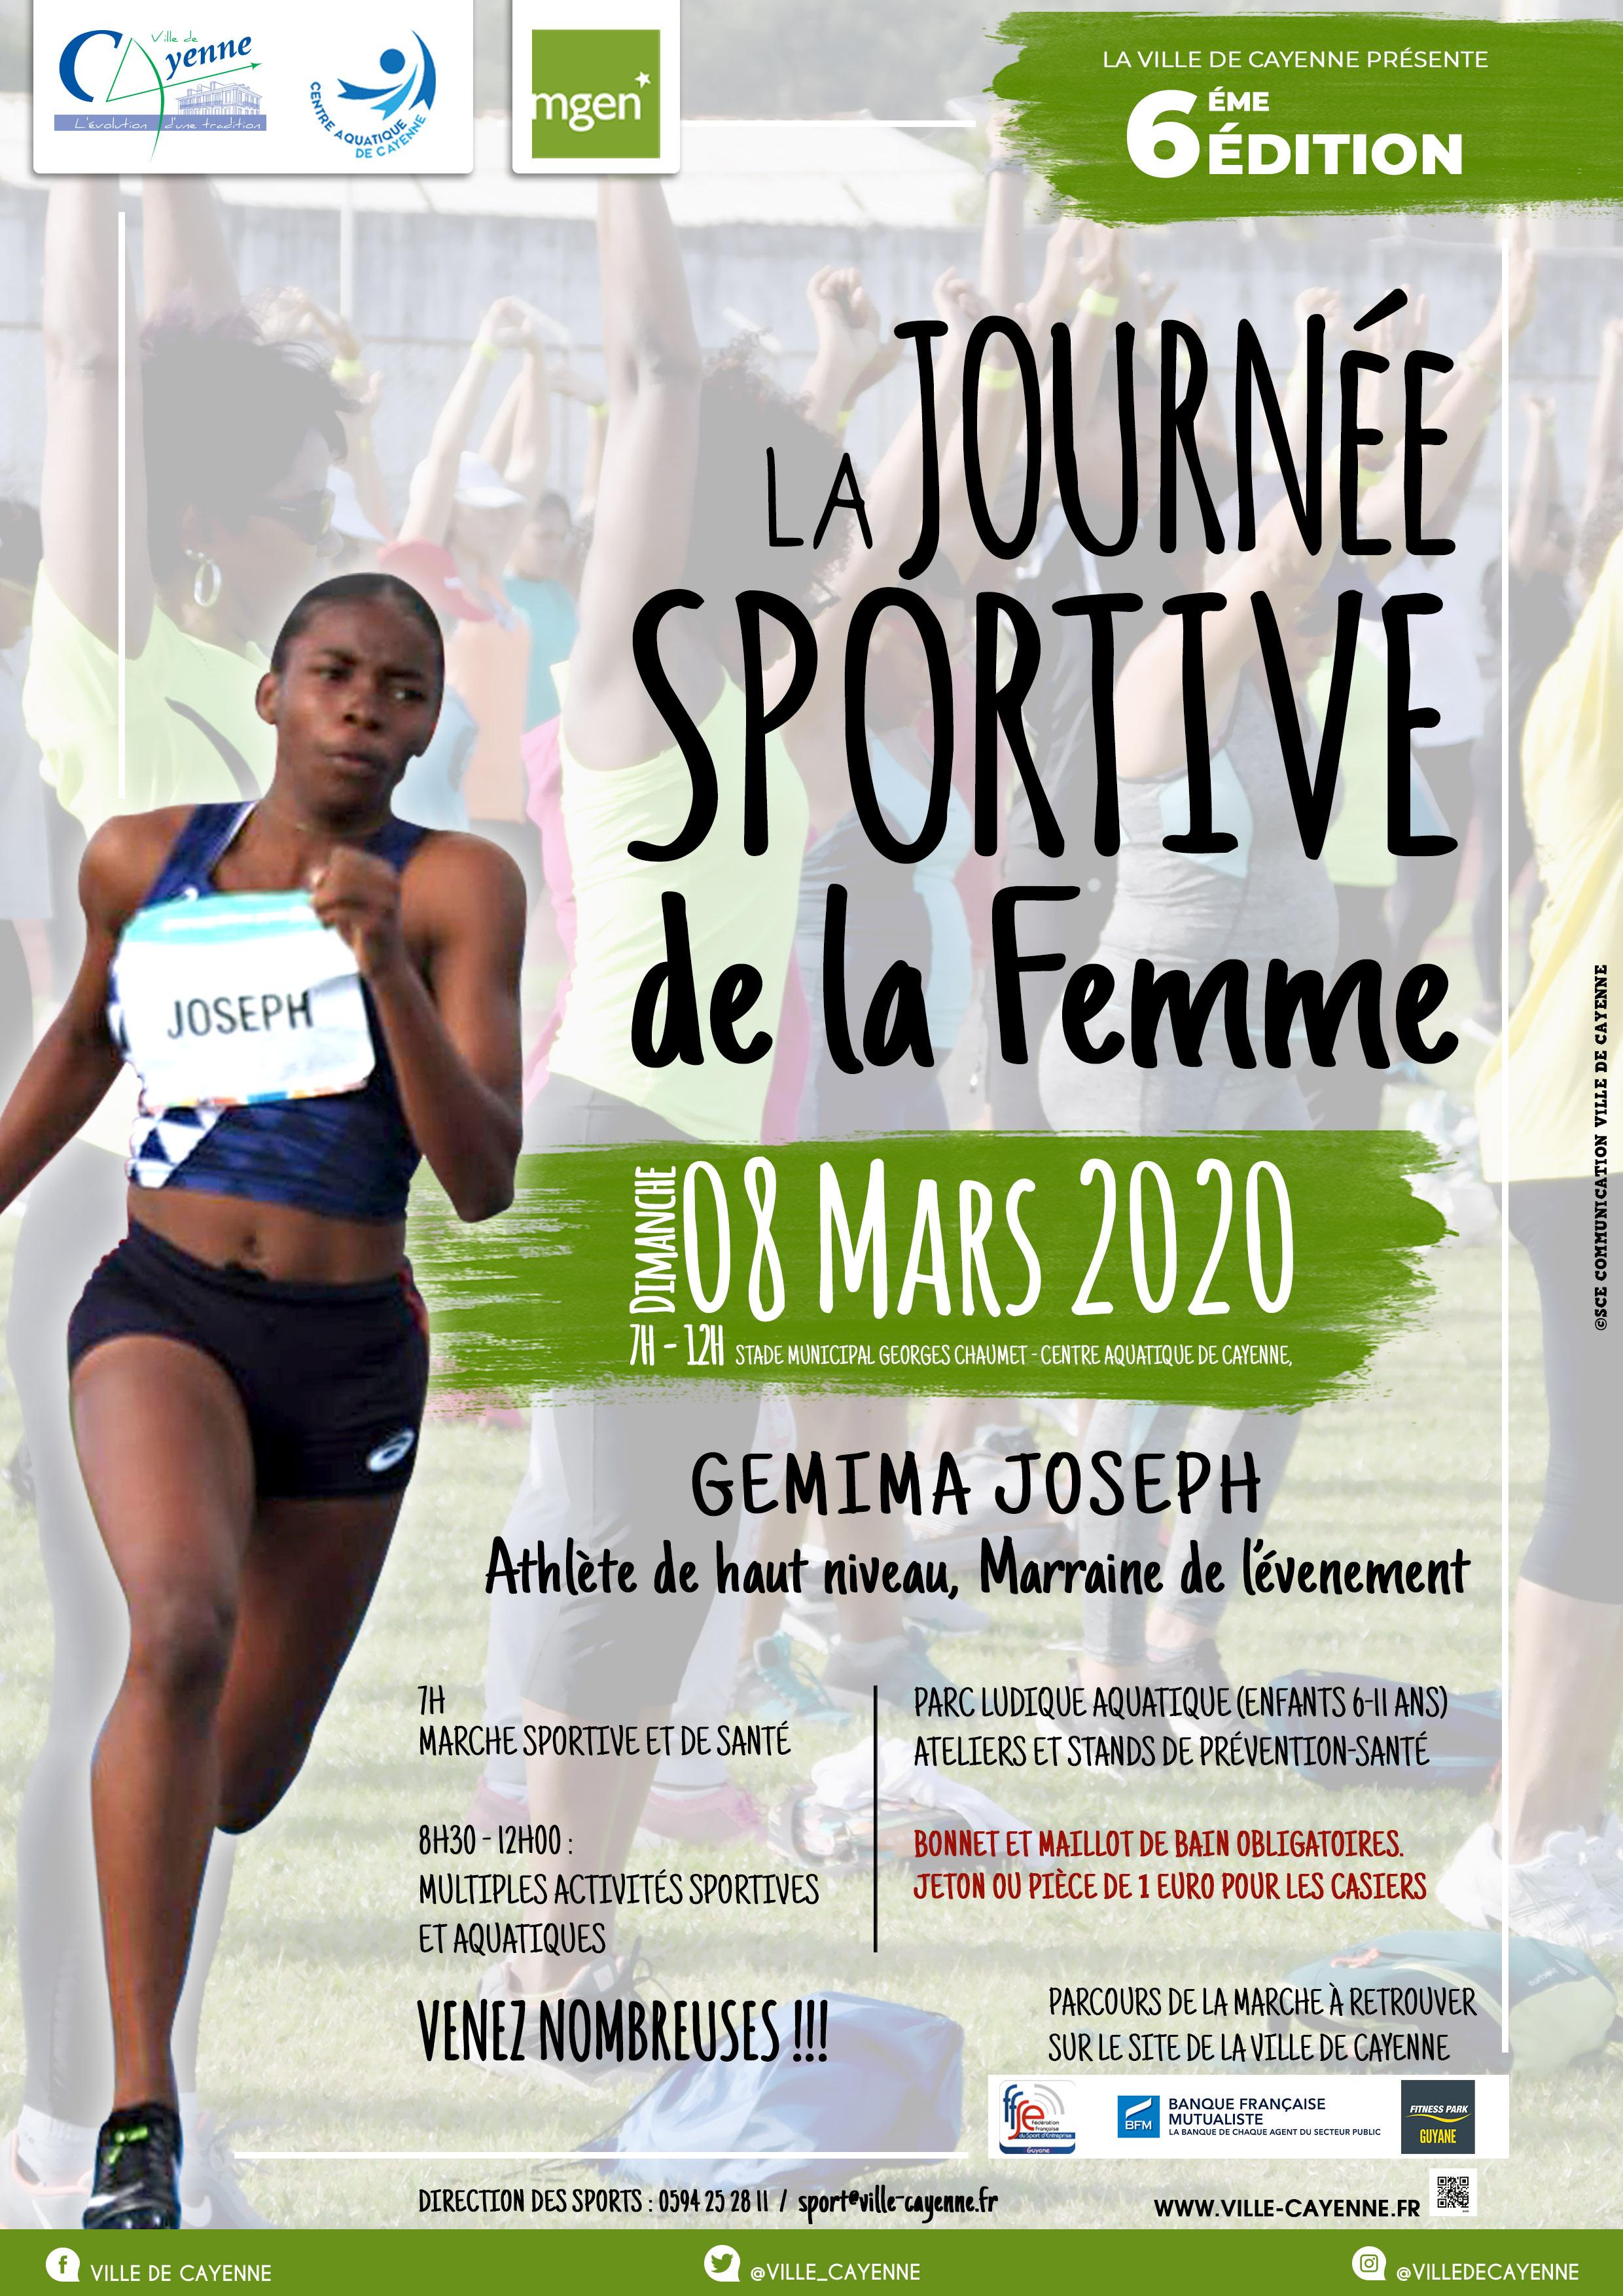 La journéee sportive de la femme